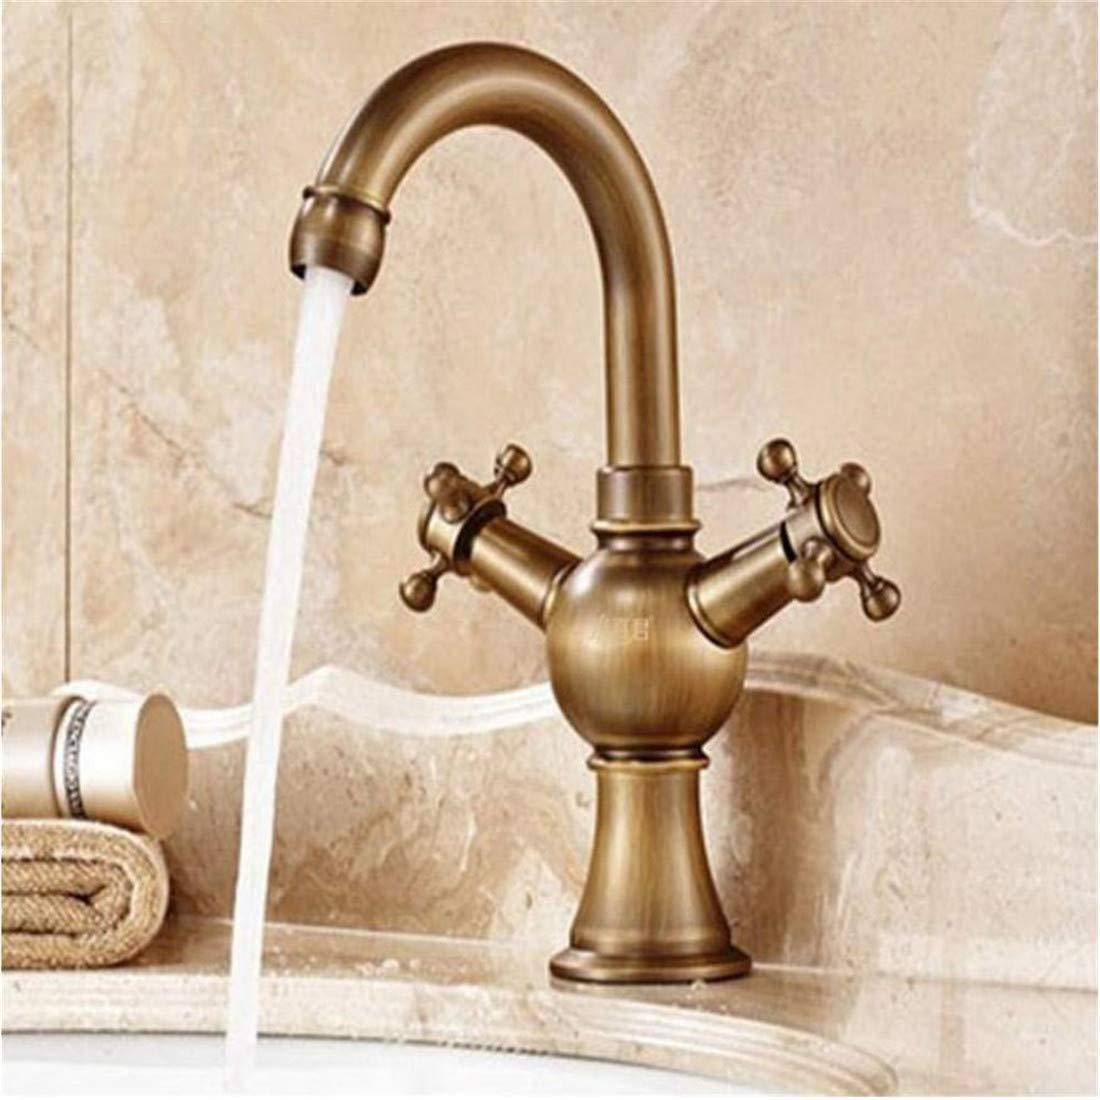 Faucet Chrome Brass Retro Style Copper Antique Hot and Cold Faucet Kitchen Basin Faucet Mixing Faucet